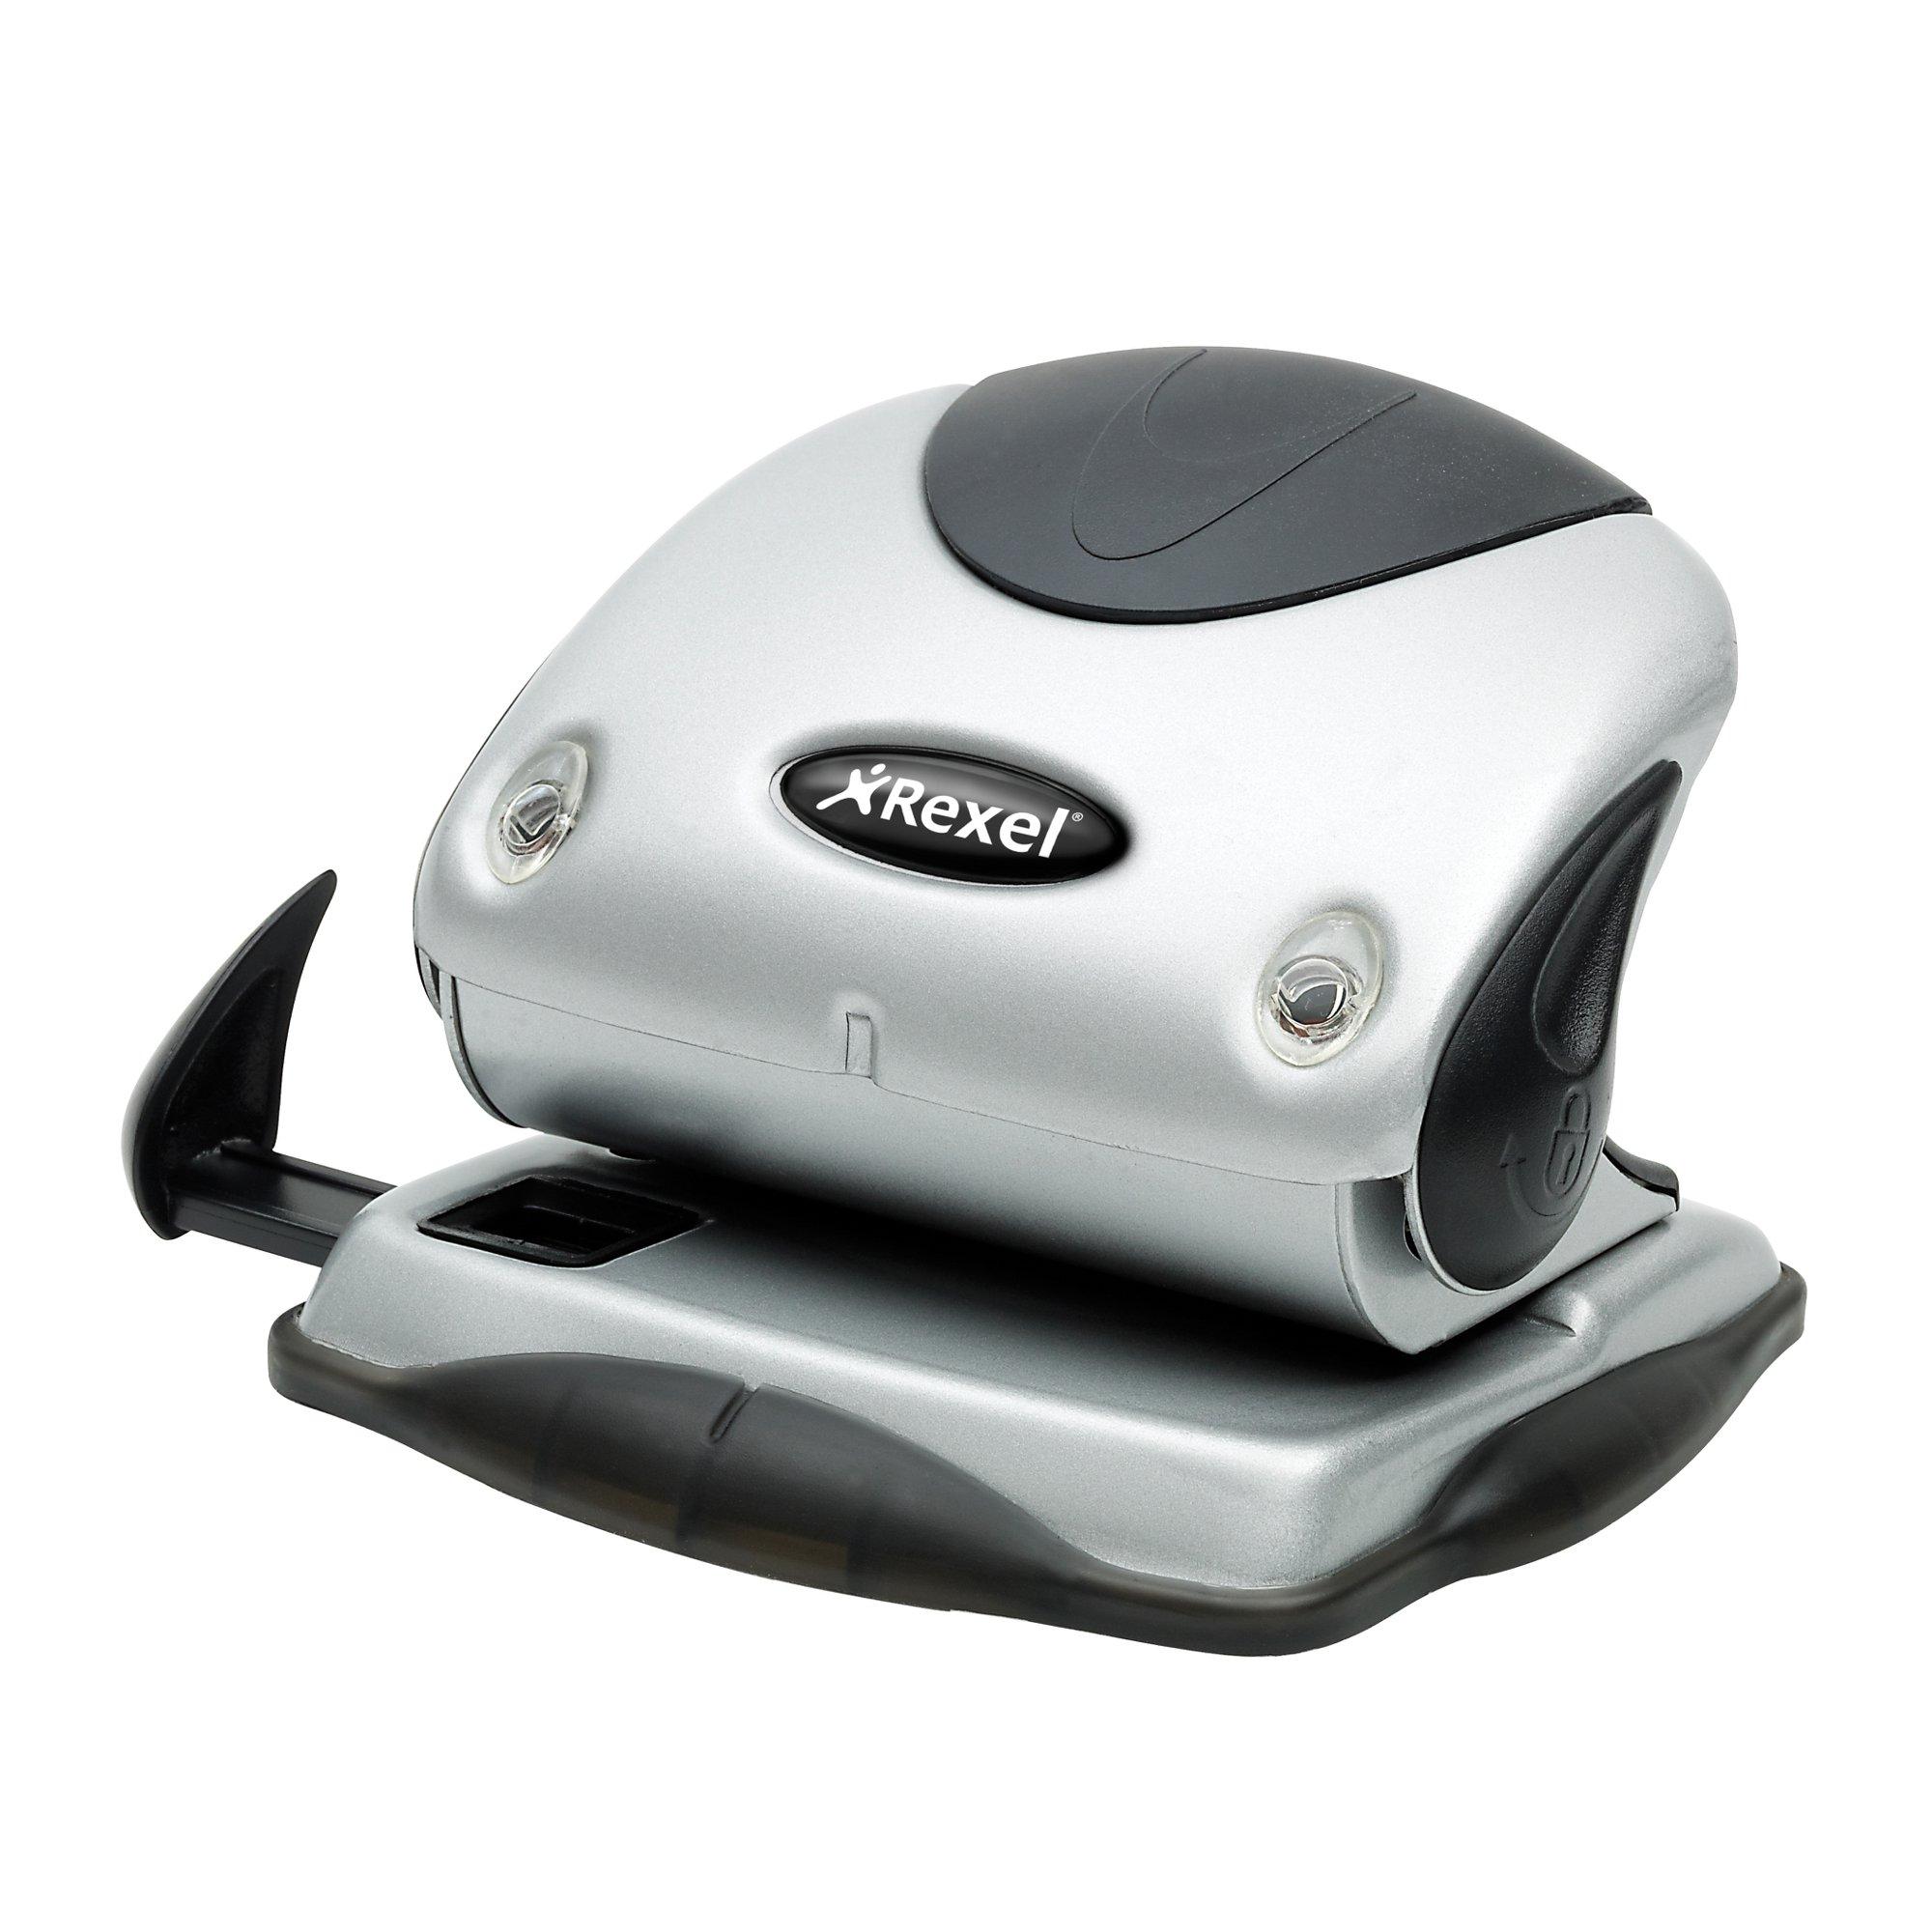 Rexel P240 Premium Punch Silver/Black 2100748